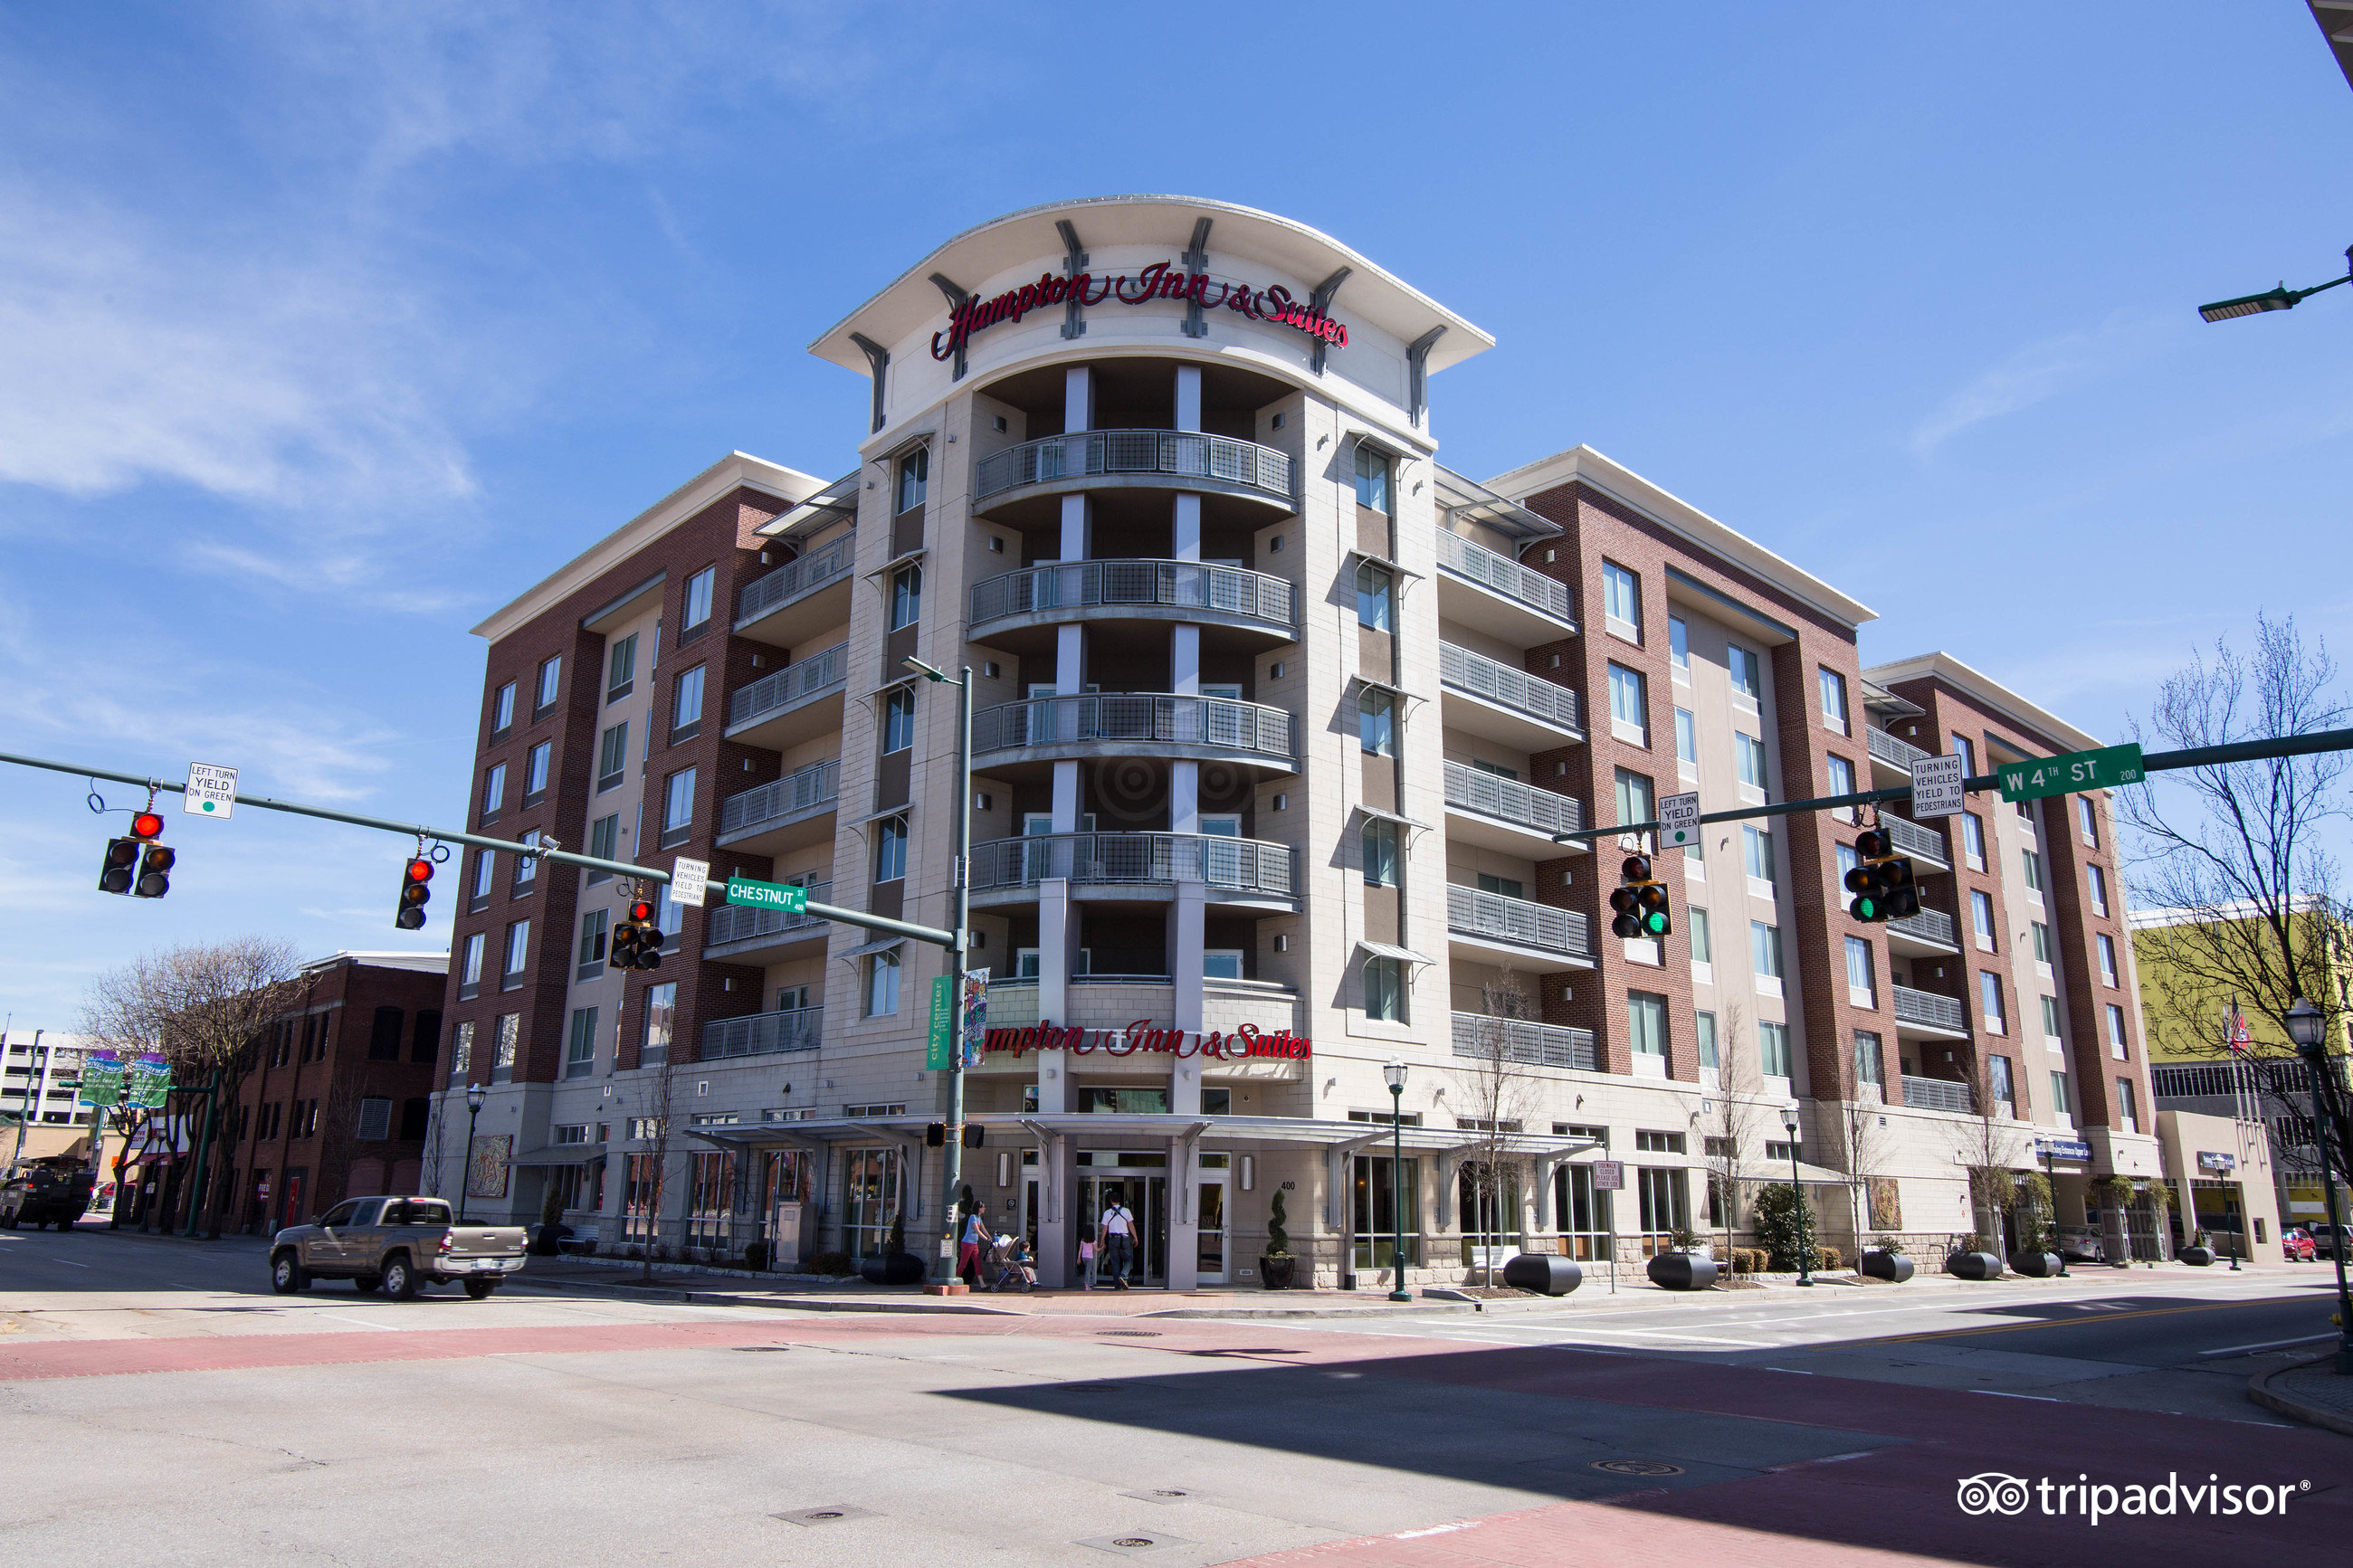 Hampton Inn Suites Chattanooga Downtown Tn 2018